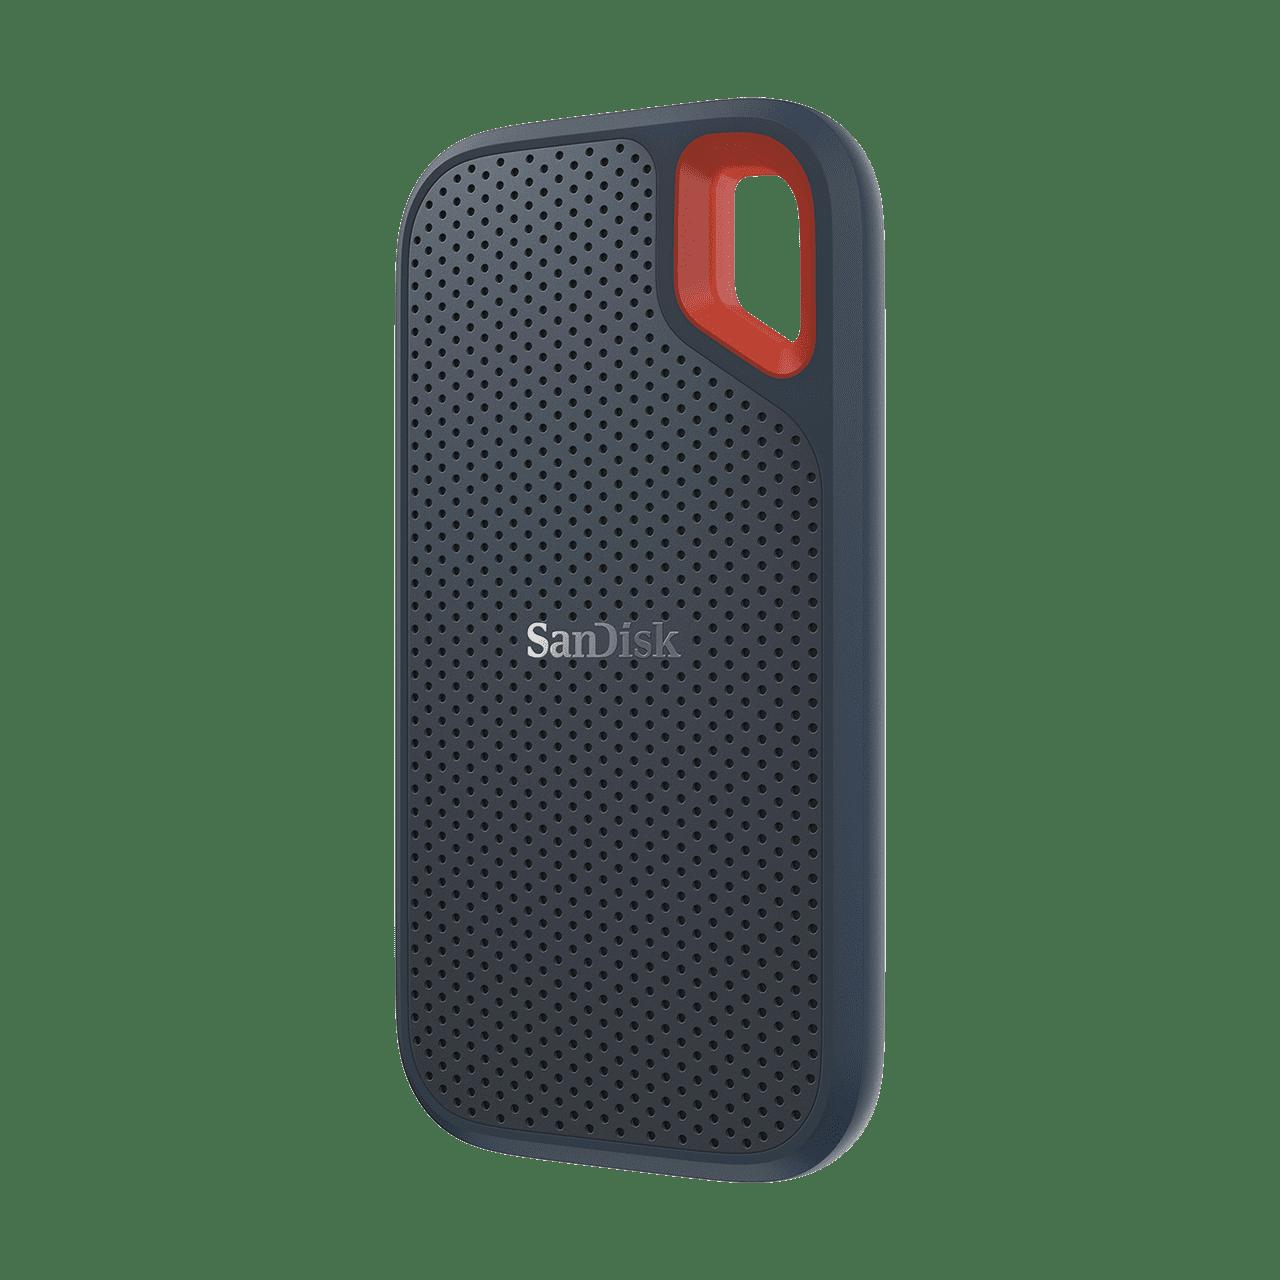 SSD накопитель SanDisk Extreme 250 GB (SDSSDE60-250G-G25)